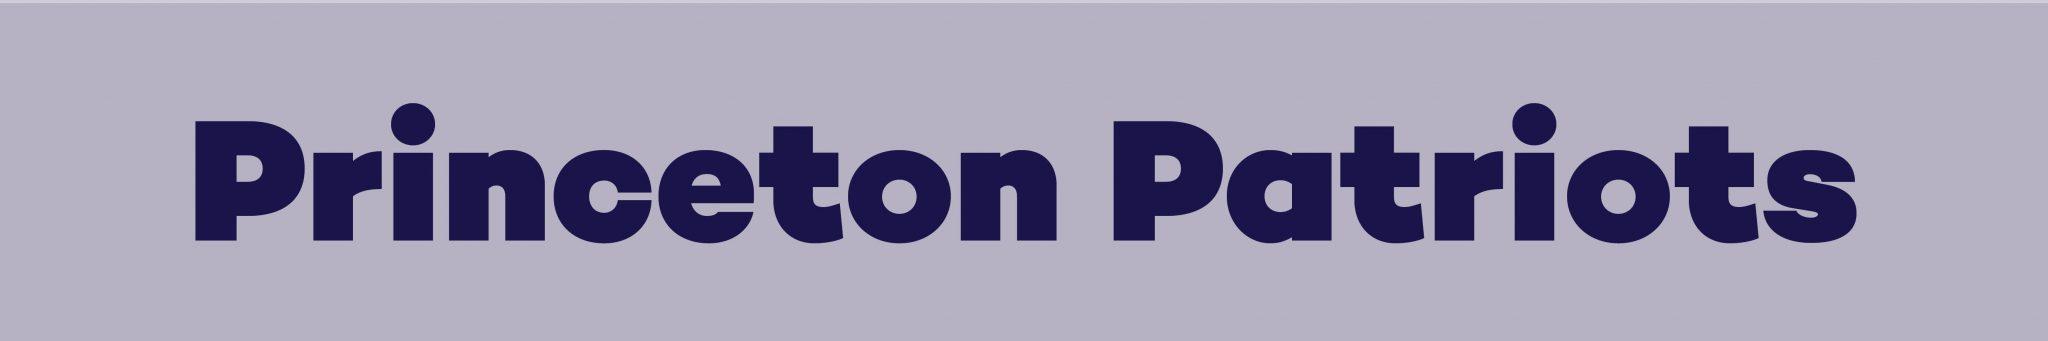 princeton patriots banner